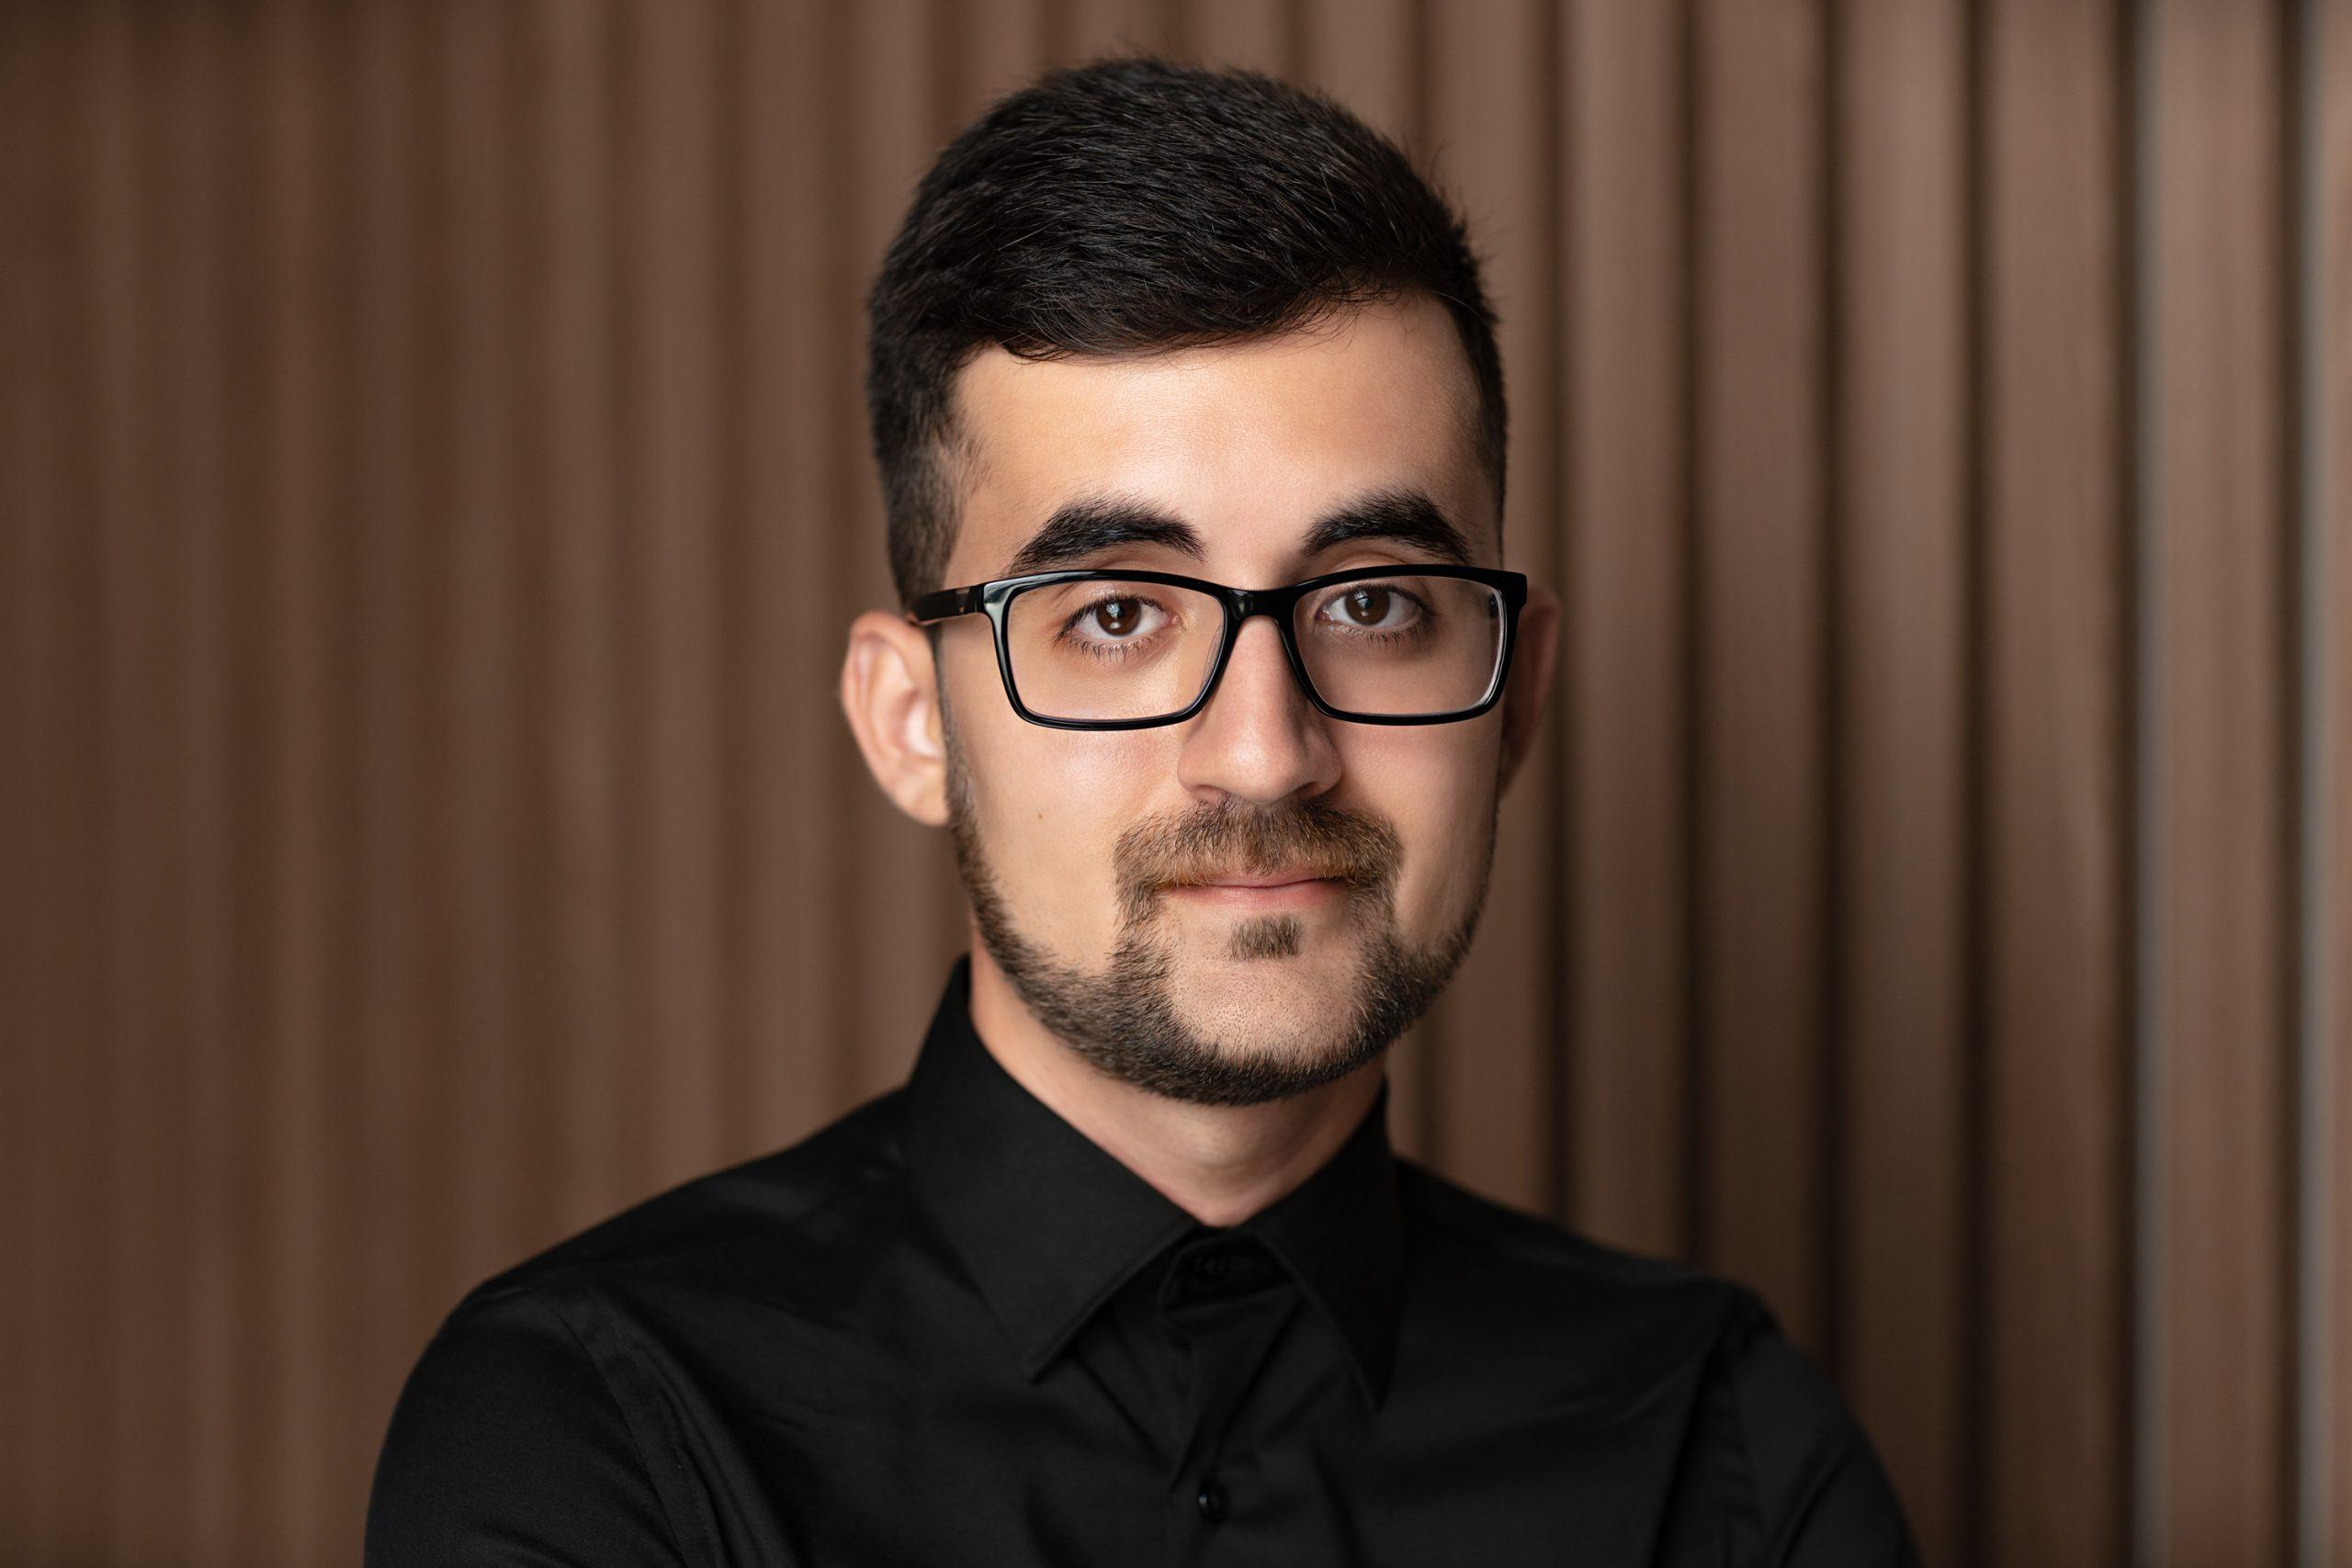 Alexandru Moraru